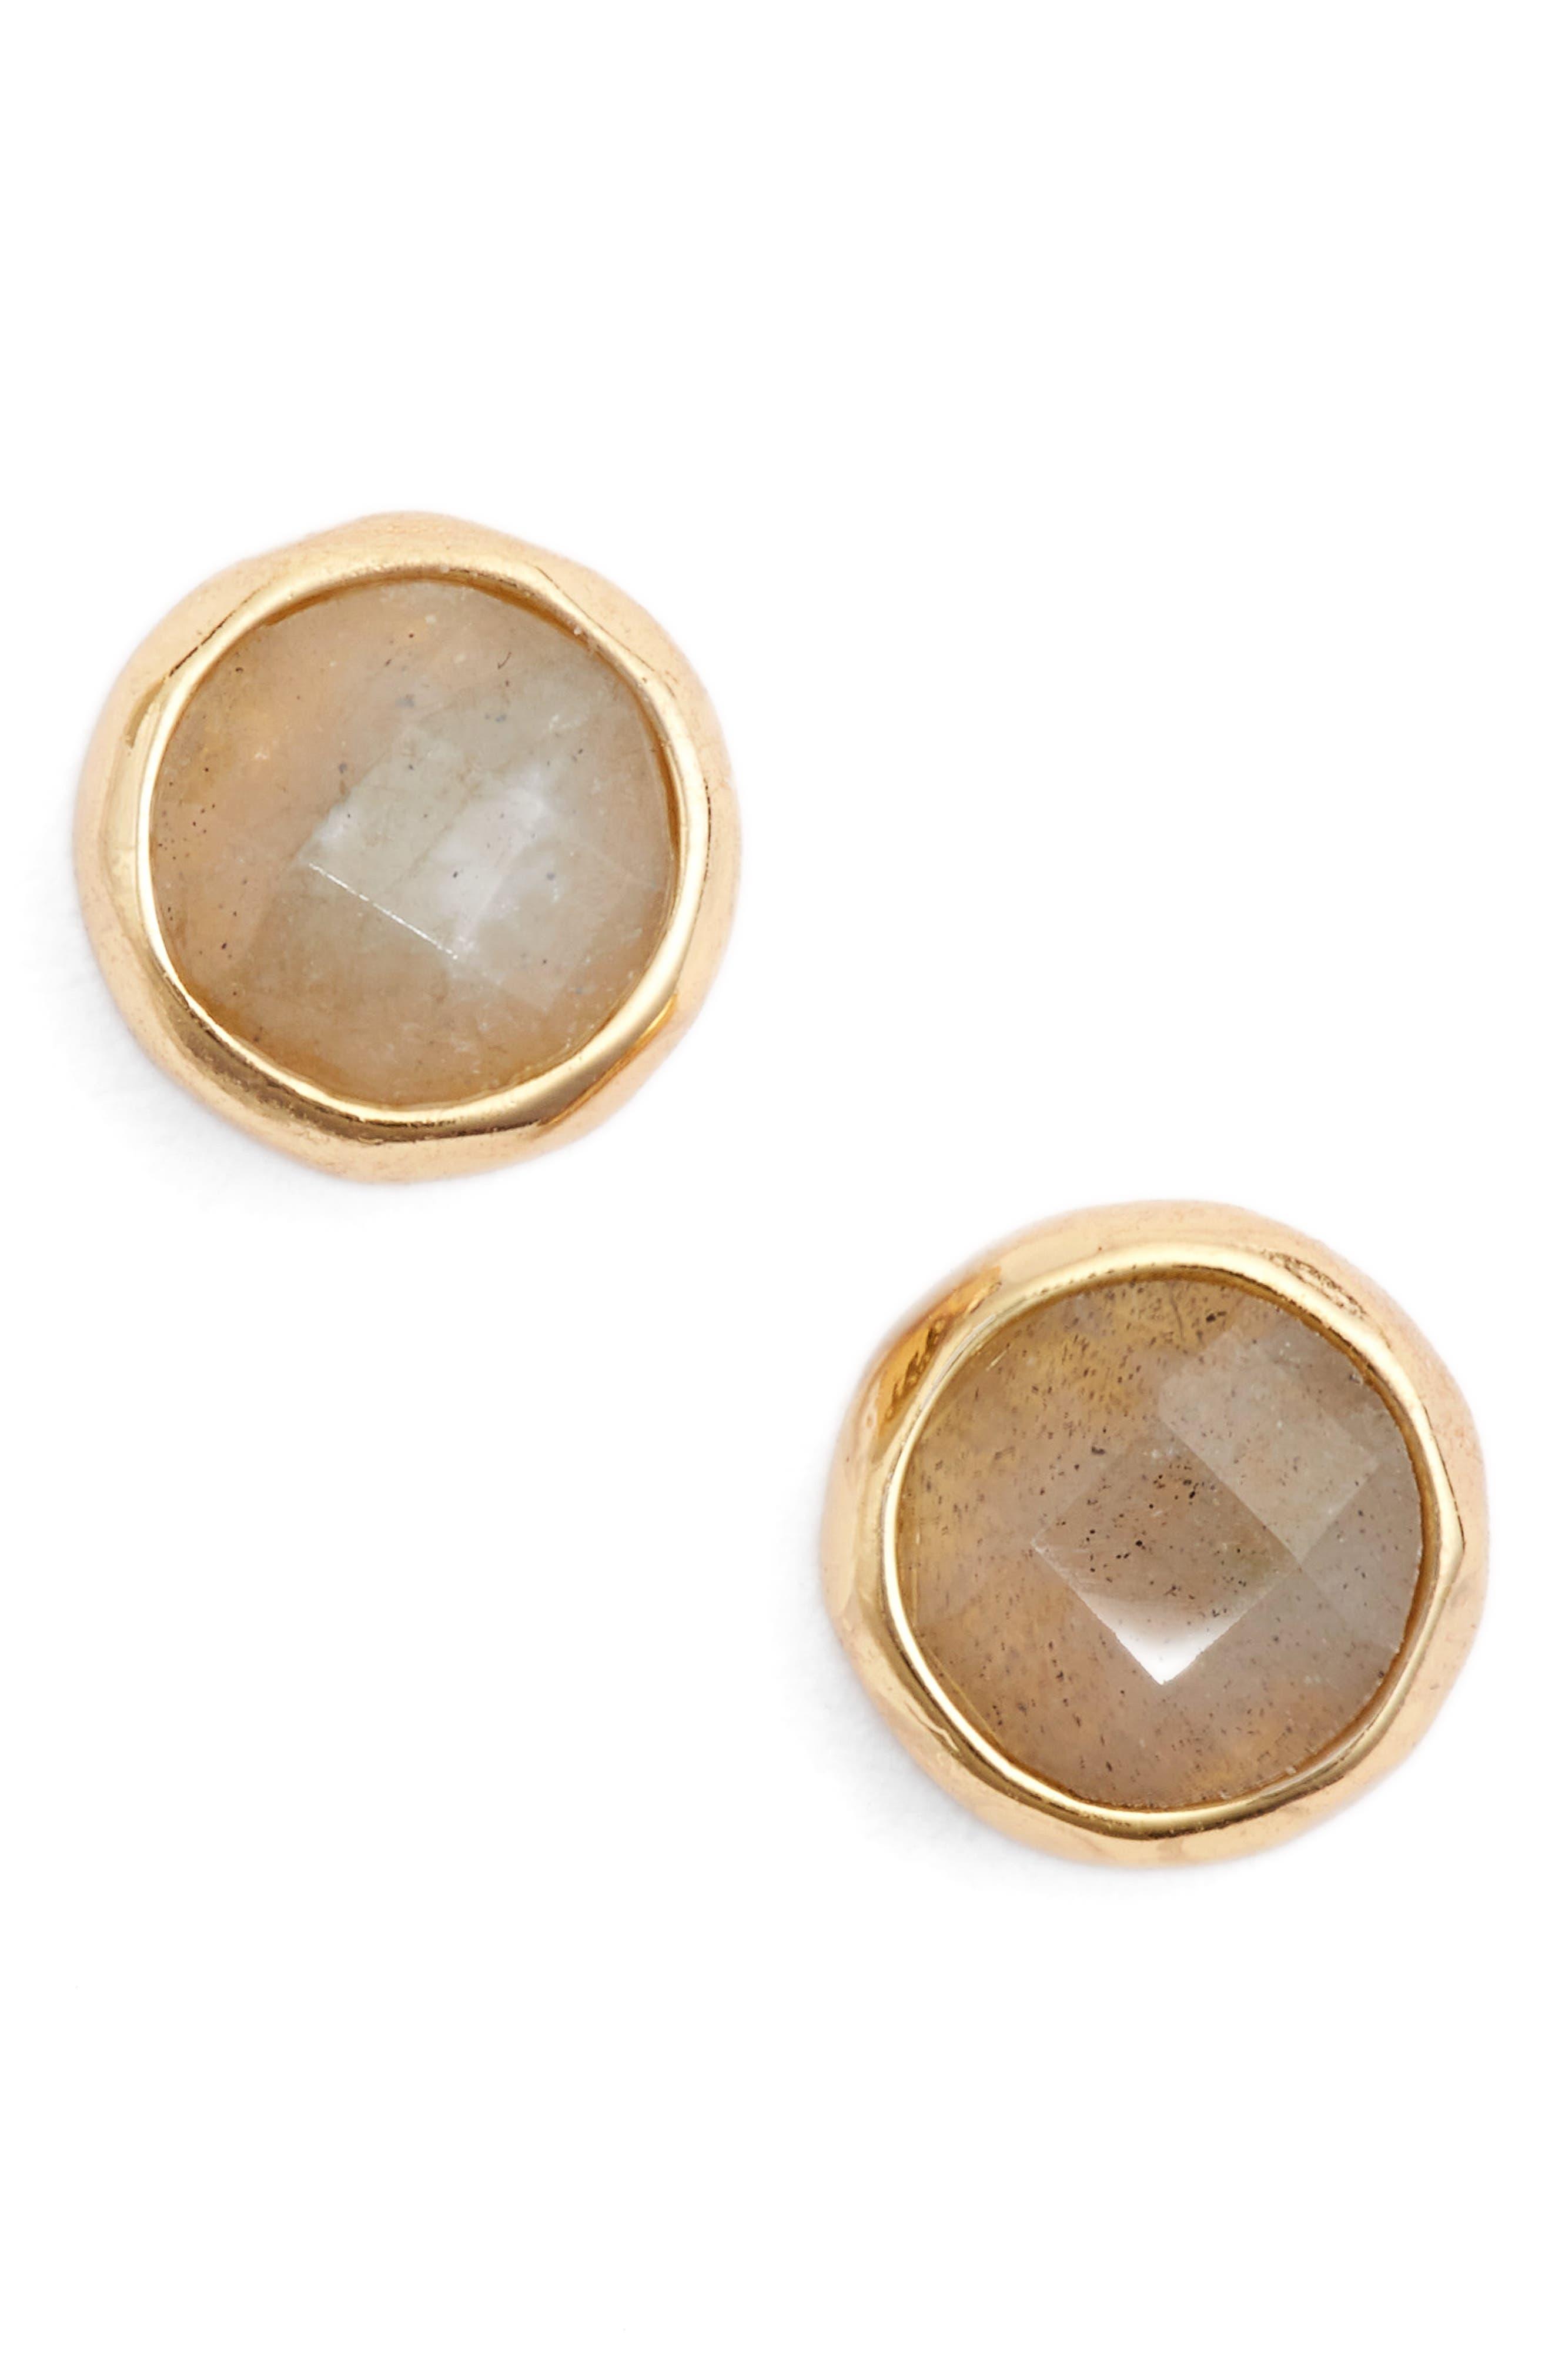 Balance Stud Earrings,                         Main,                         color, Labradorite/ Gold